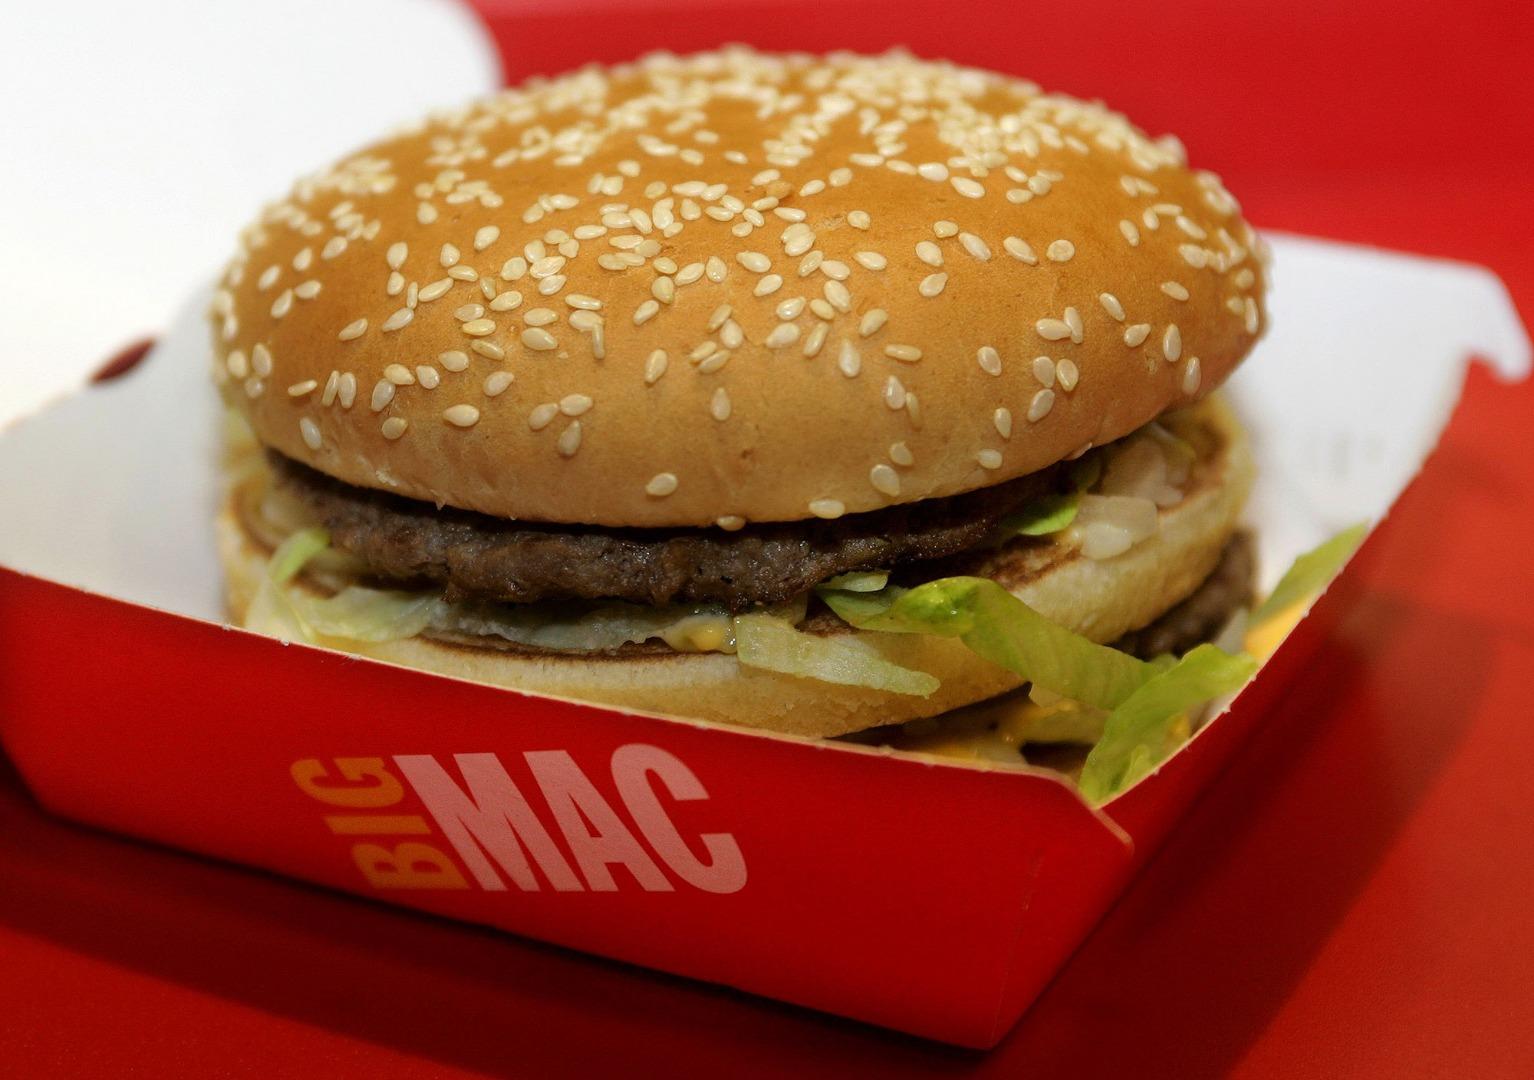 McDonald's artık Big Mac ismini kullanamayacak!